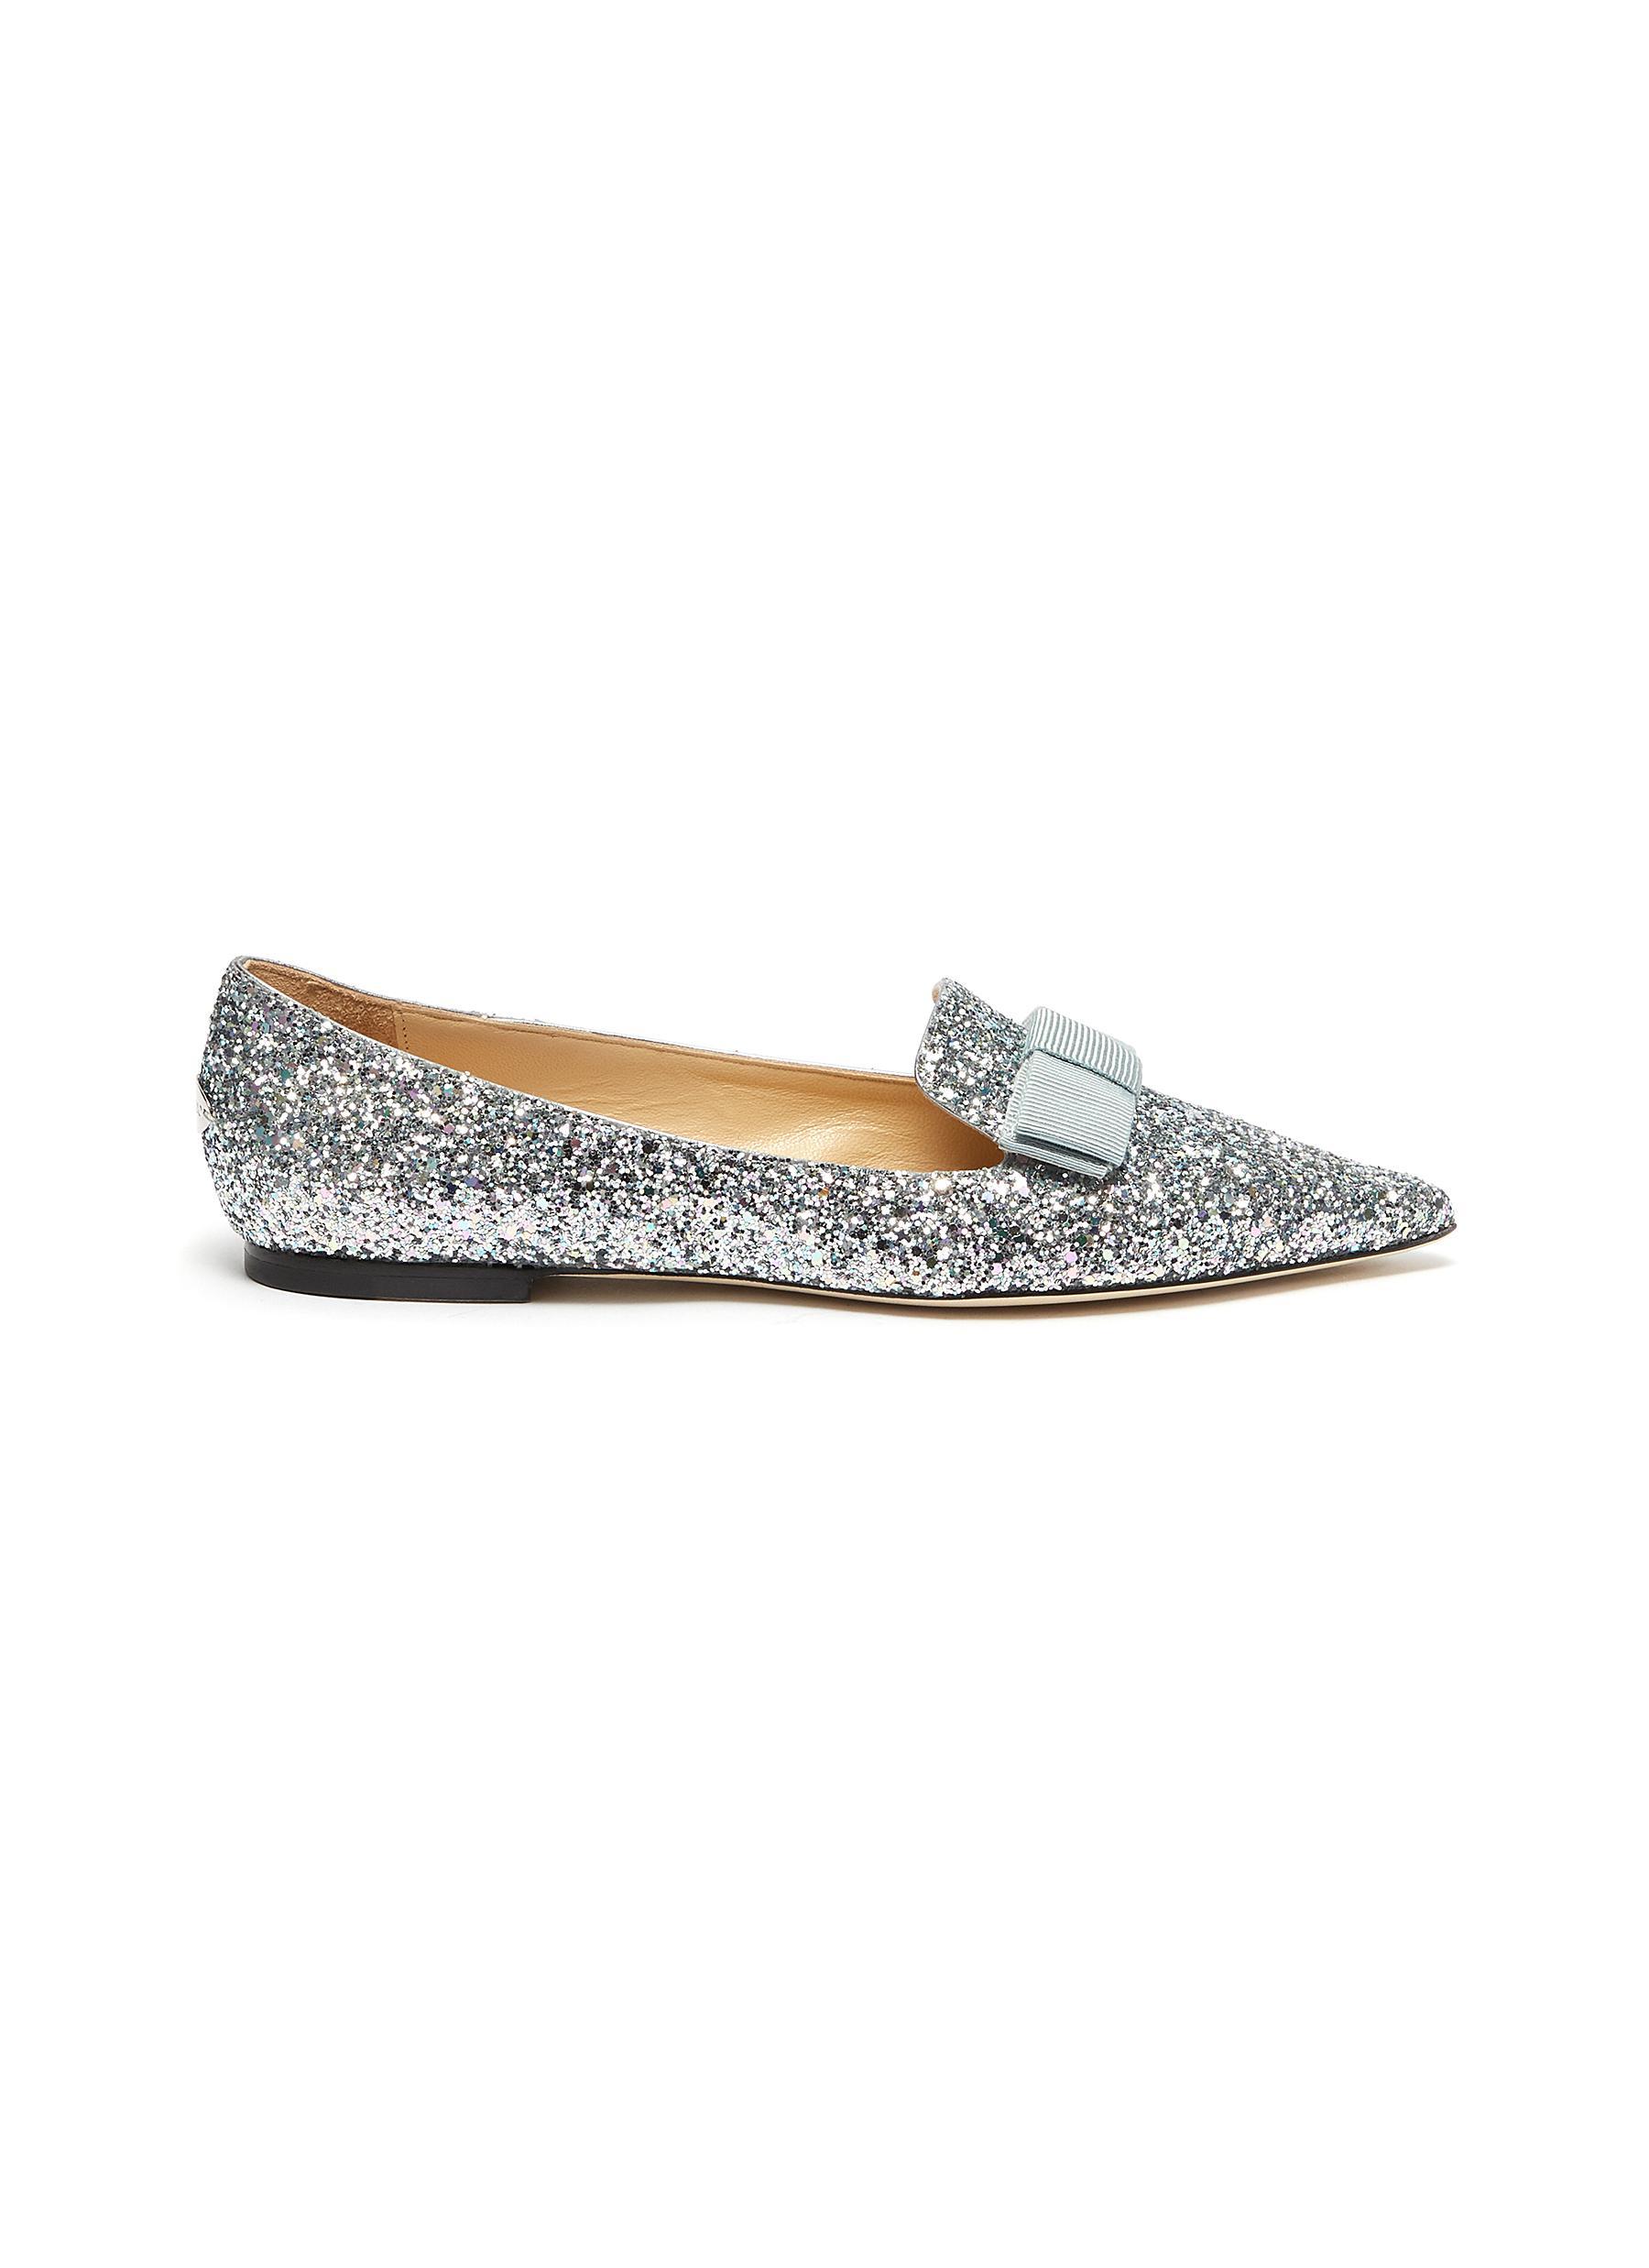 Jimmy Choo Flats Gala bow coarse glitter loafers